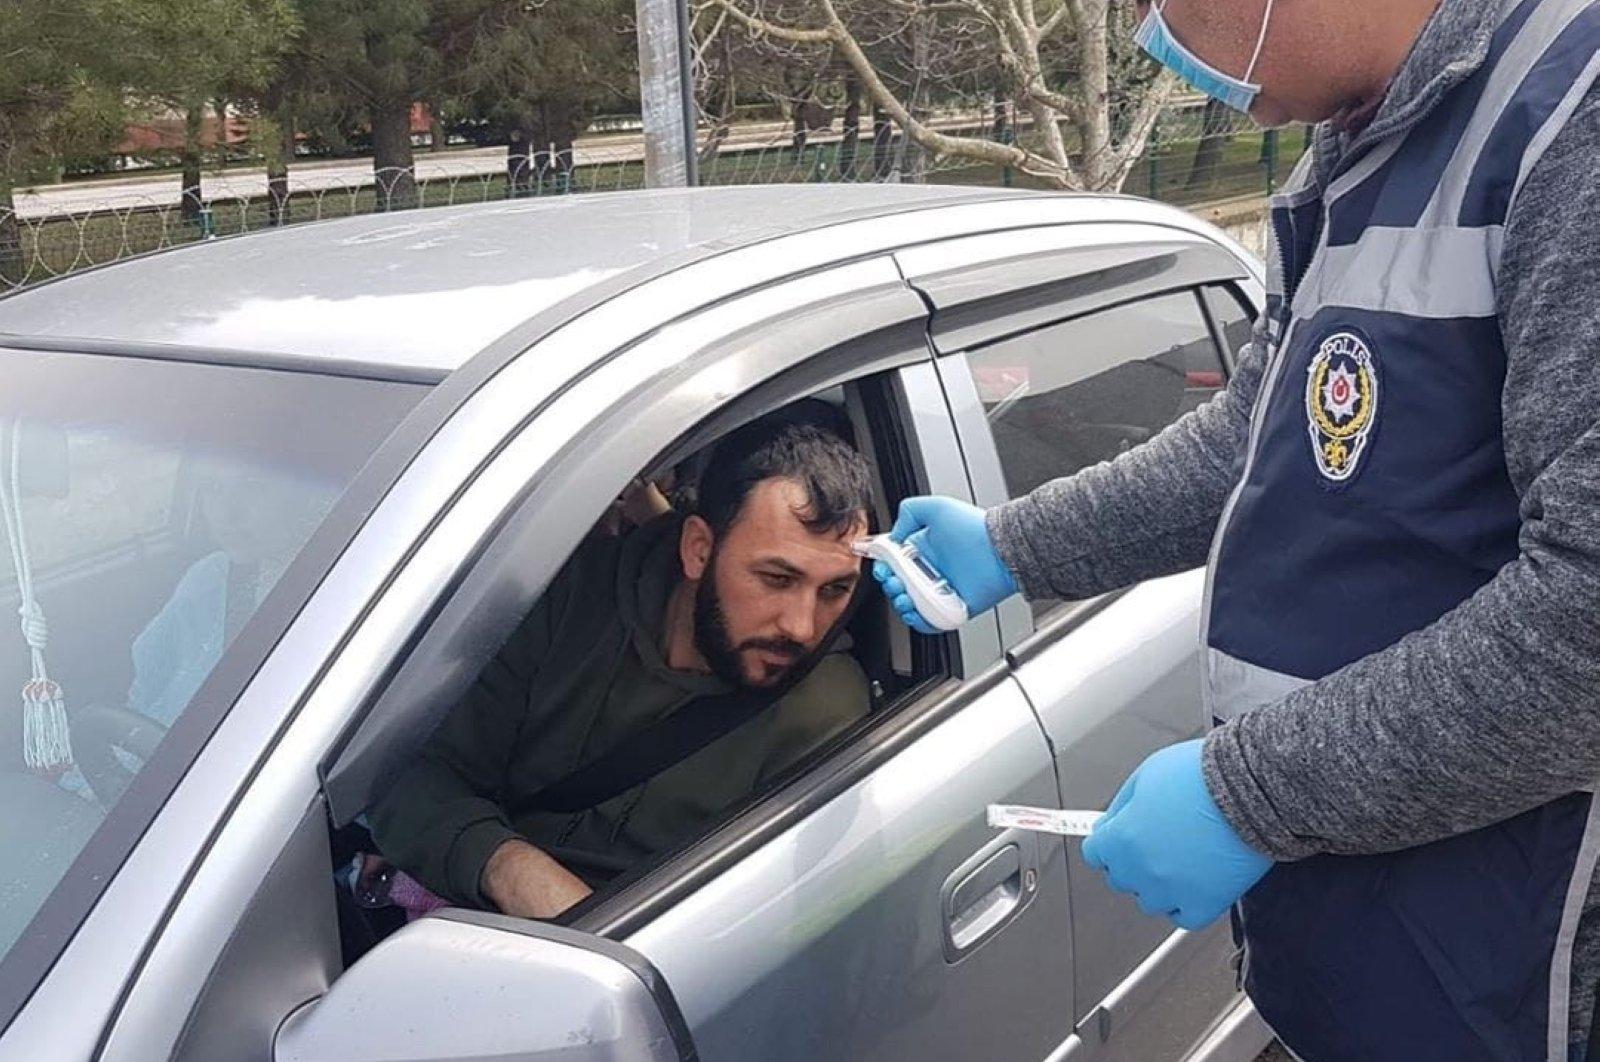 A police officer checks the temperature of a driver in Kırklareli, Turkey, Saturday, March 28, 2020. (İHA Photo)